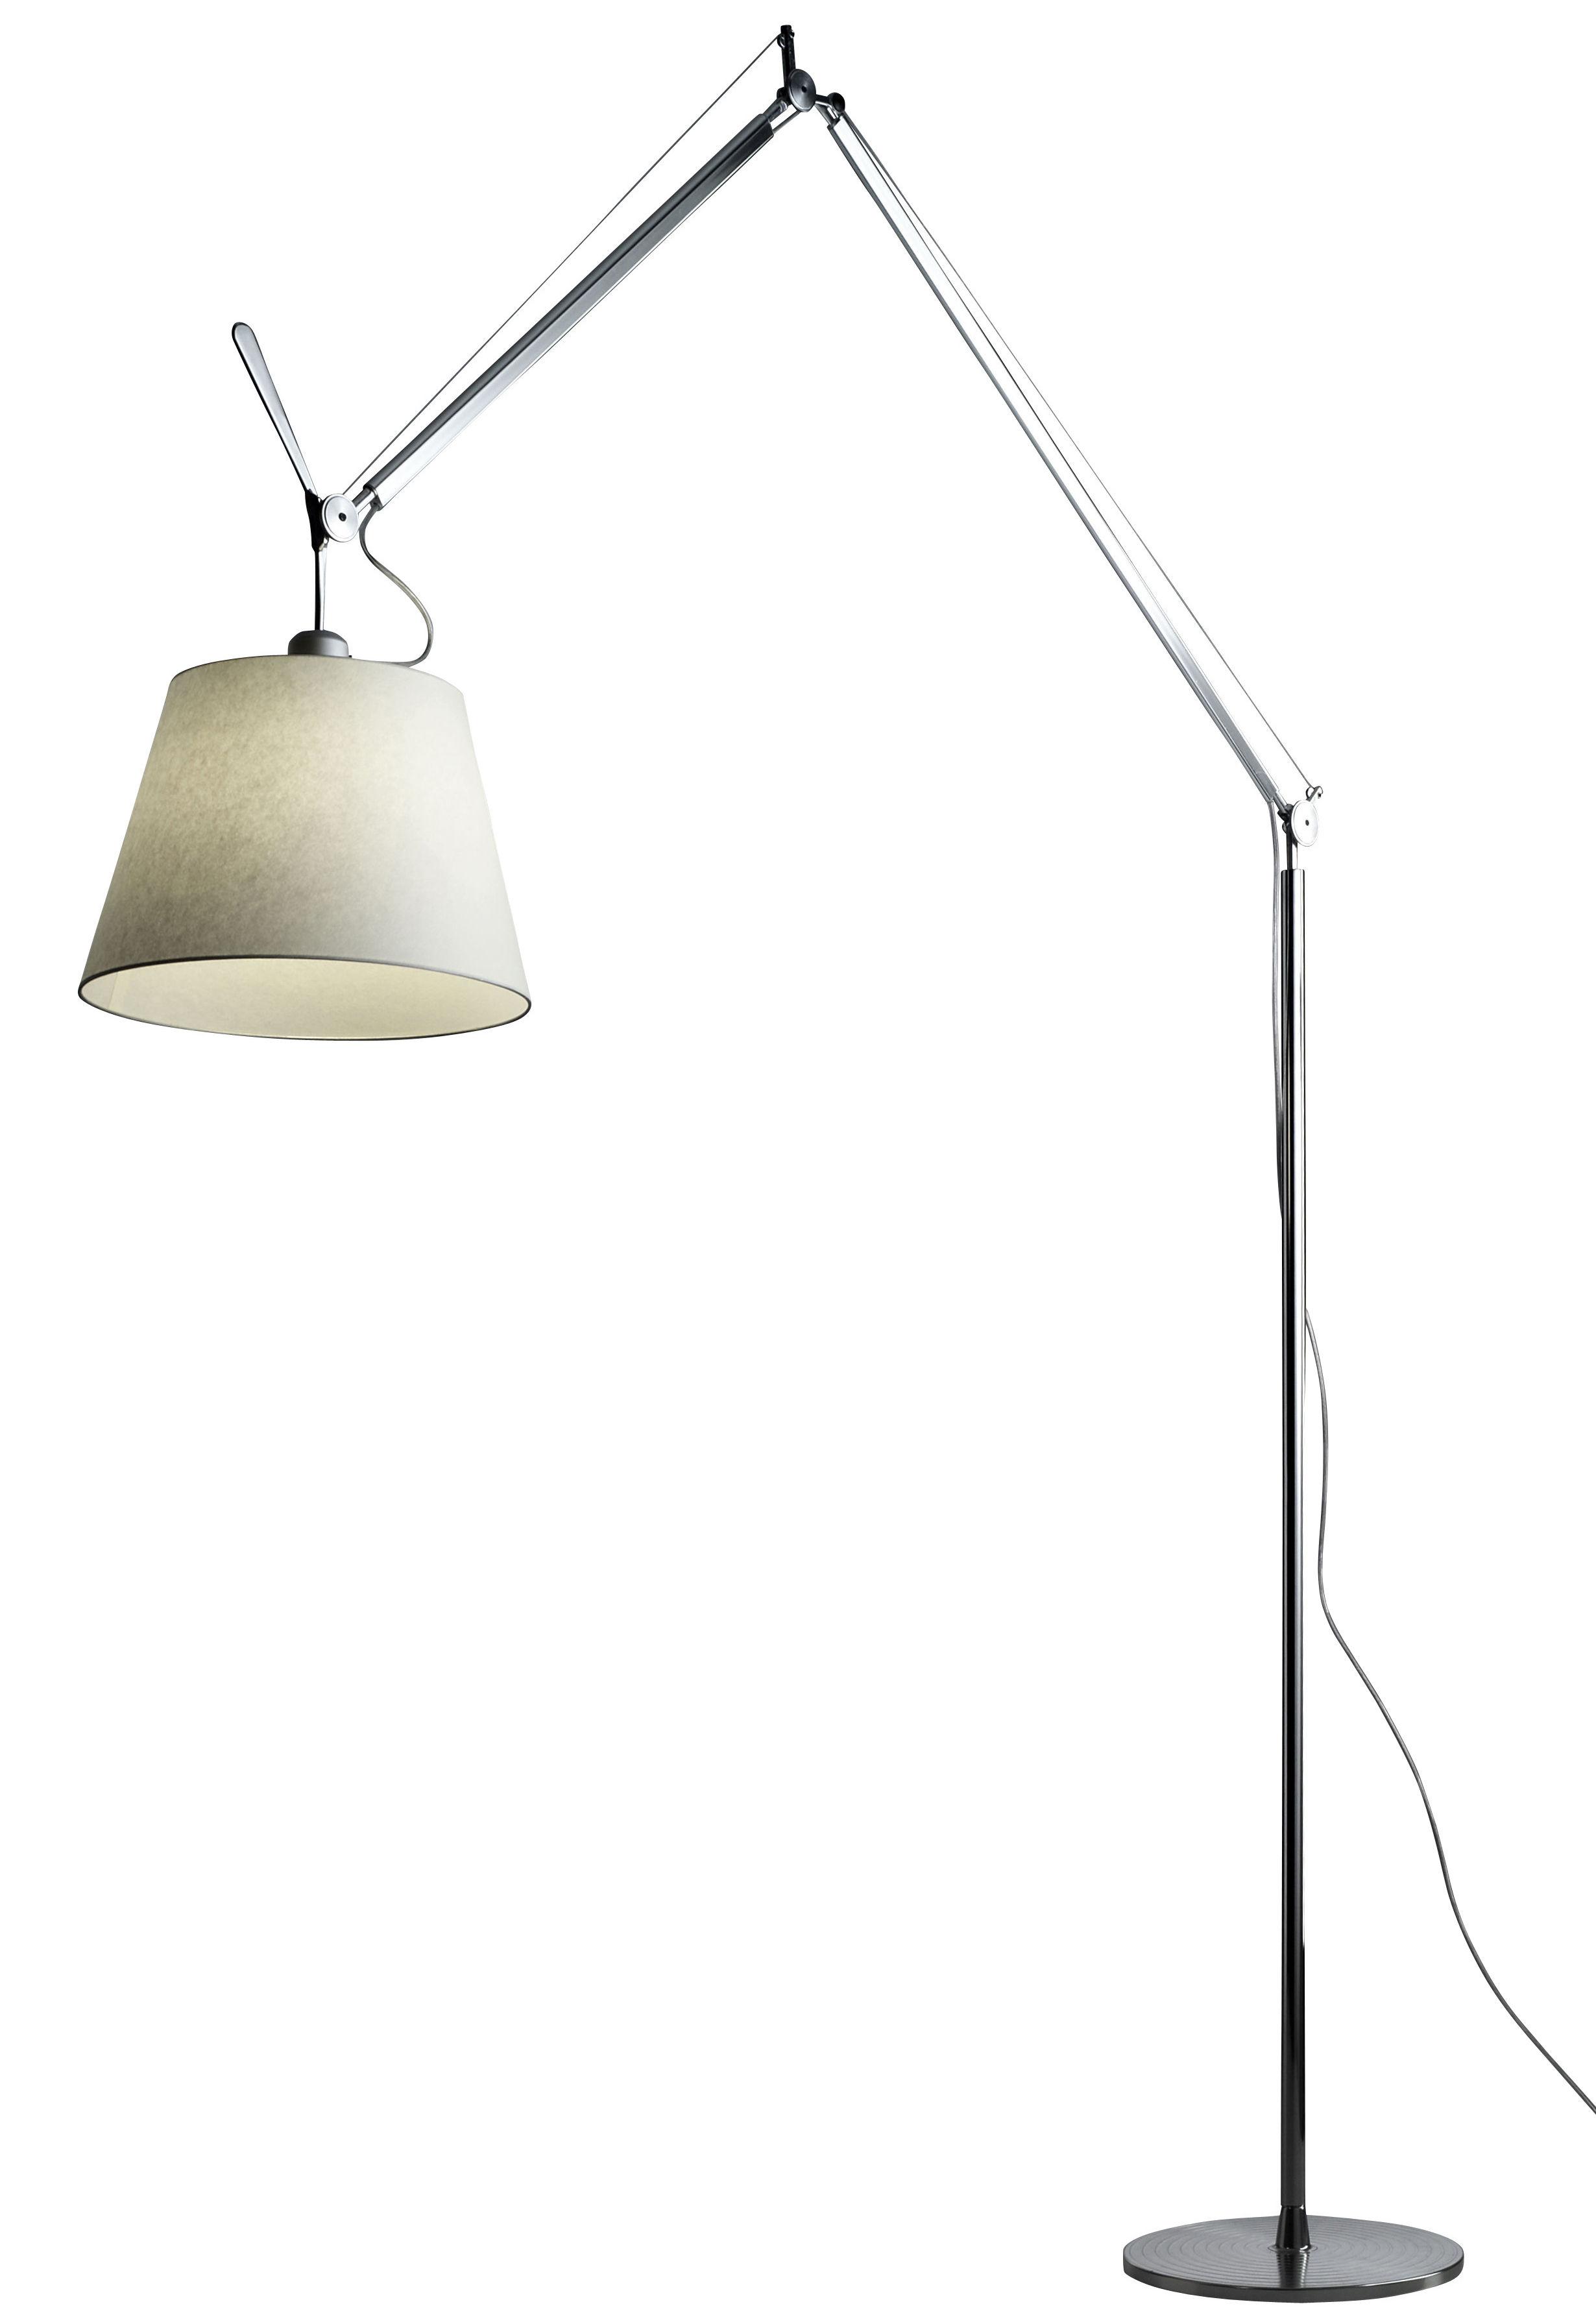 Luminaire - Lampadaires - Lampadaire Tolomeo Mega LED / Ø 42 cm - H 148 à 327 cm - Artemide - Ecru / Pied alu - Aluminium poli, Papier parchemin